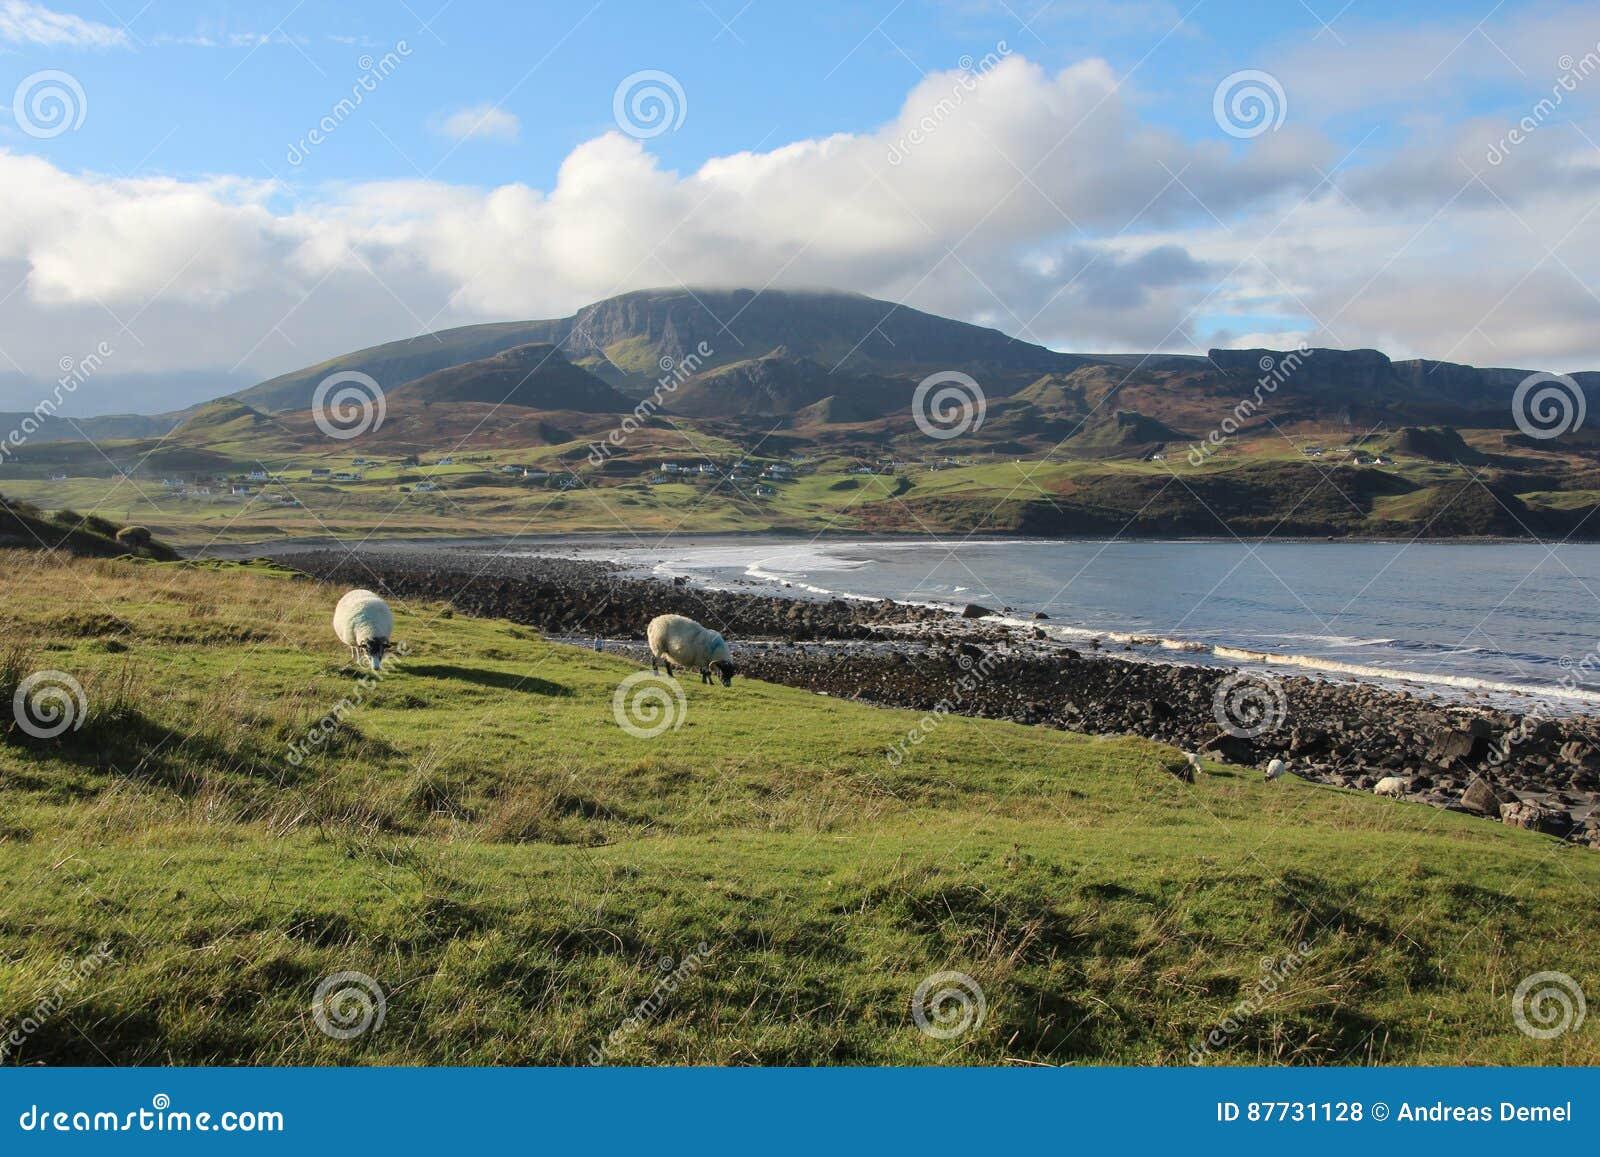 Landscape on Isle of Skye